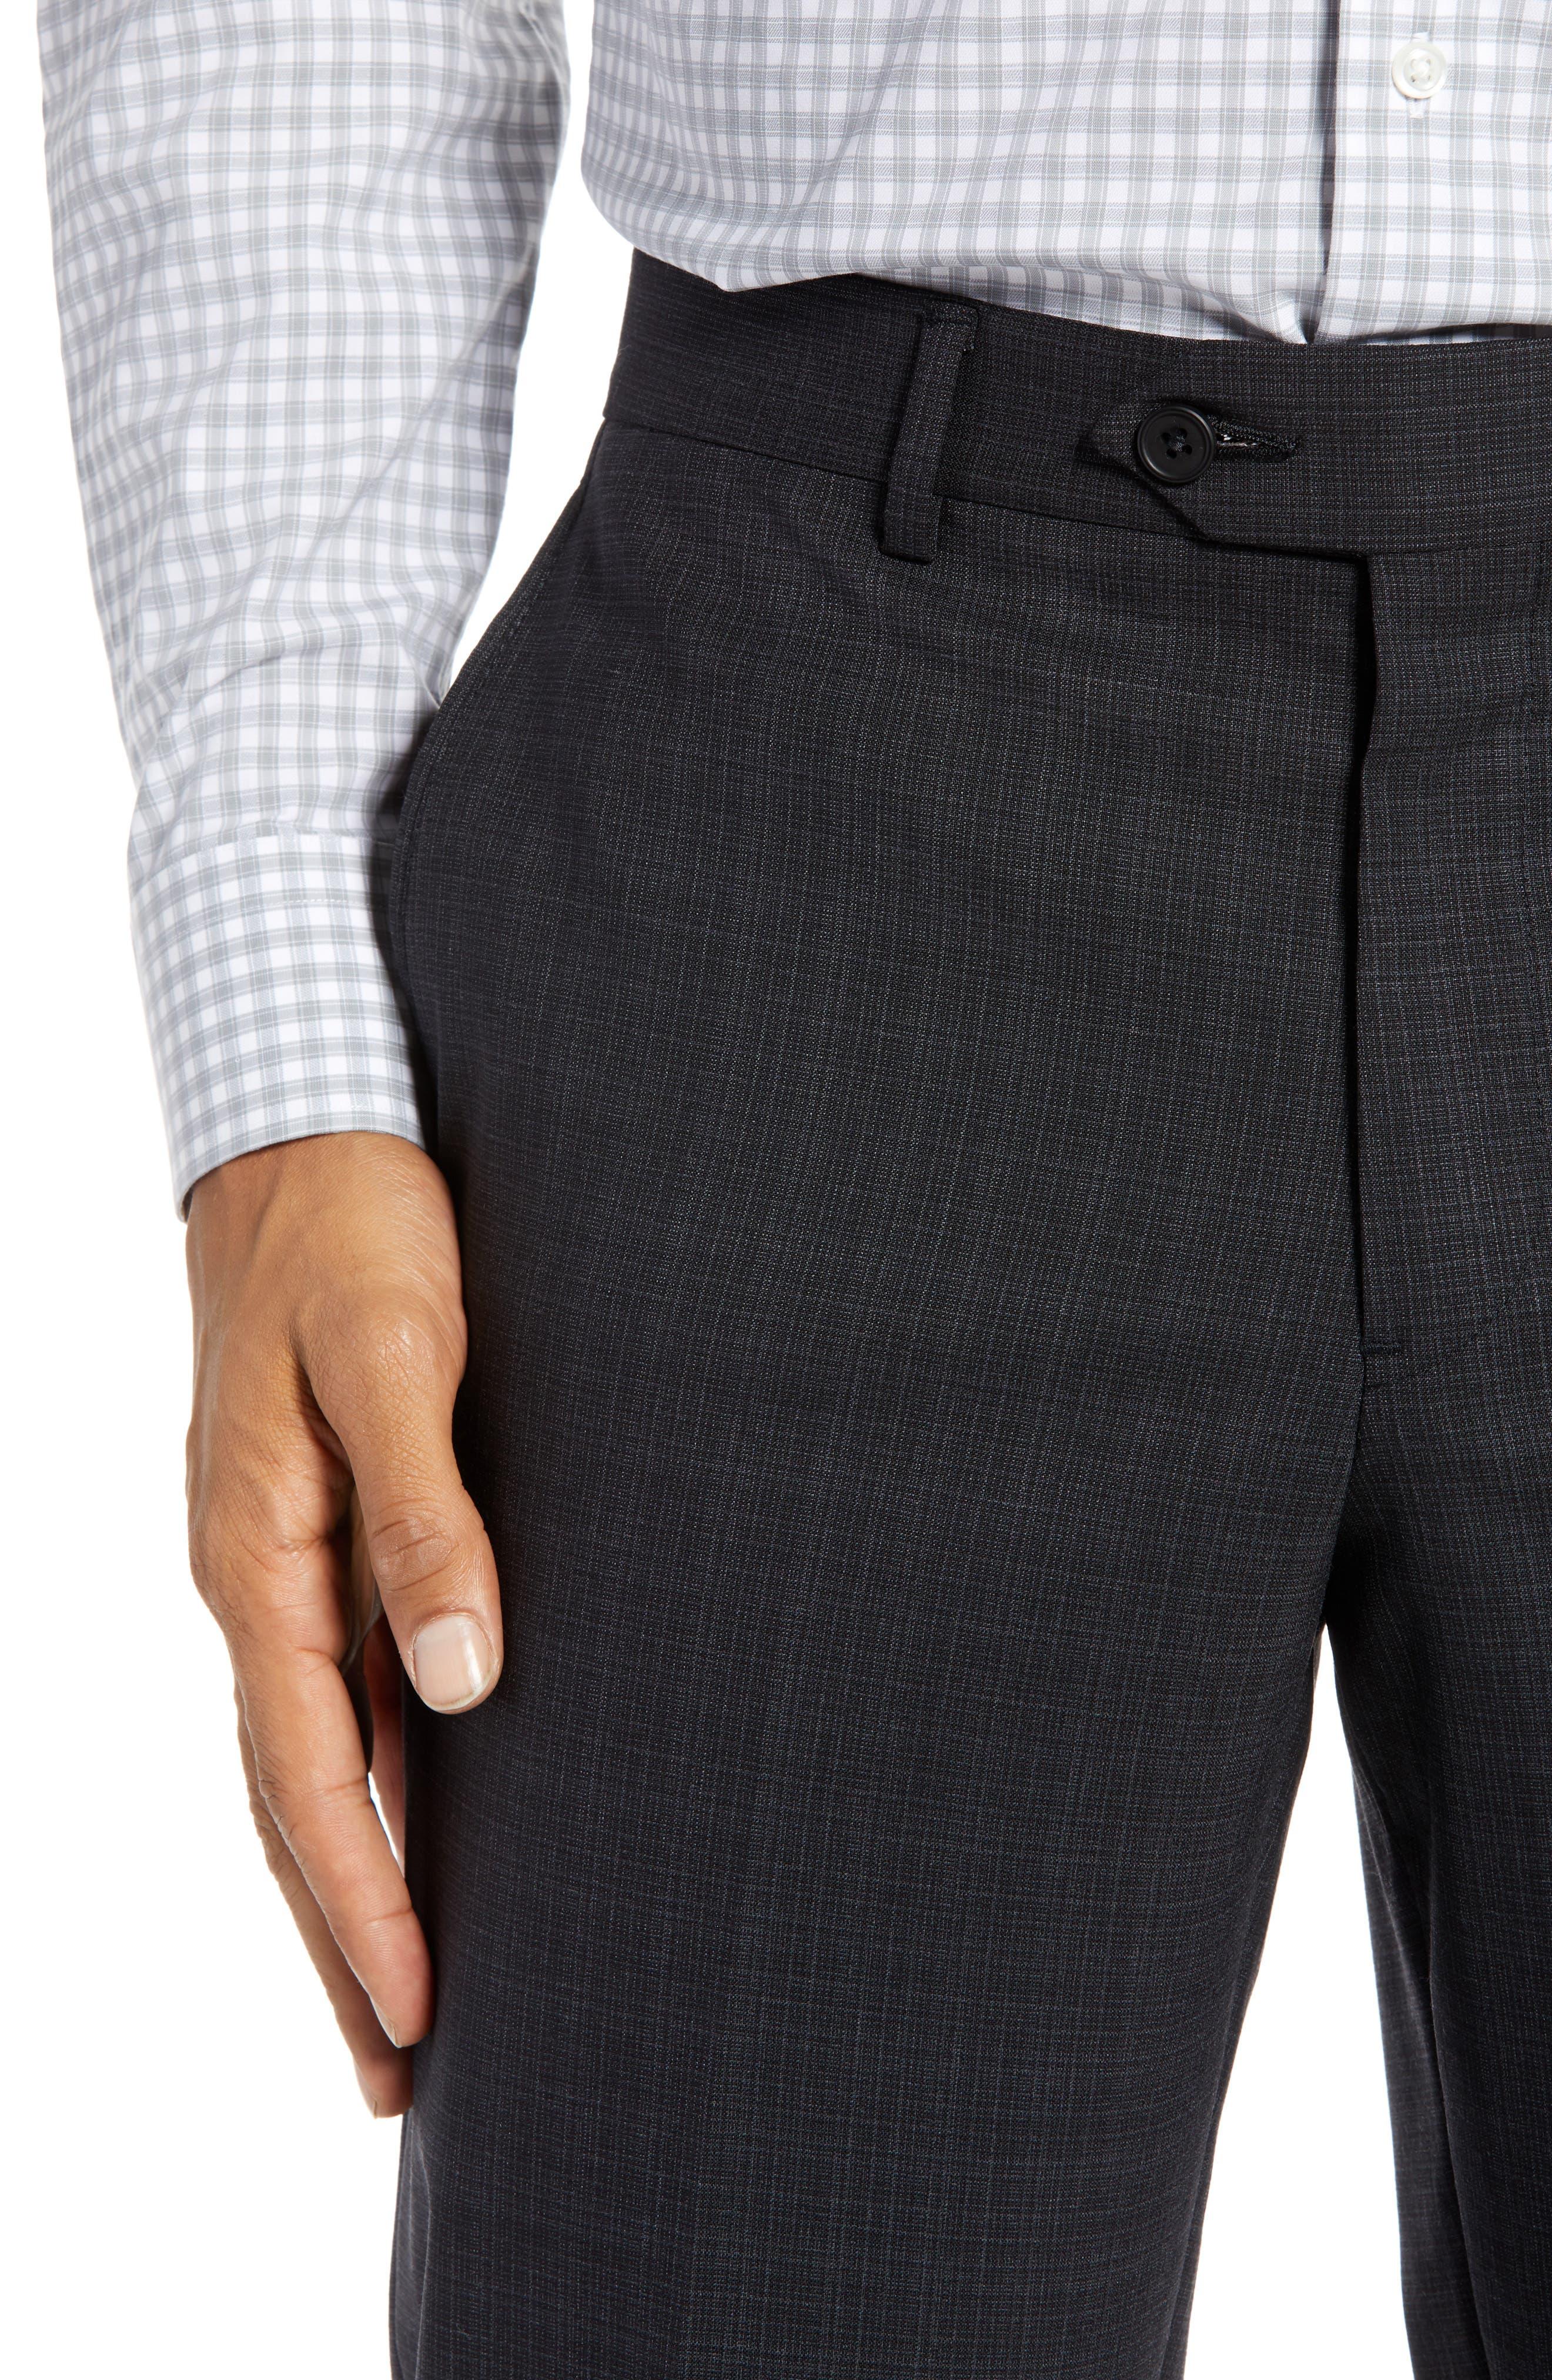 Trim Fit Flat Front Stretch Wool Pants,                             Alternate thumbnail 4, color,                             BLACK